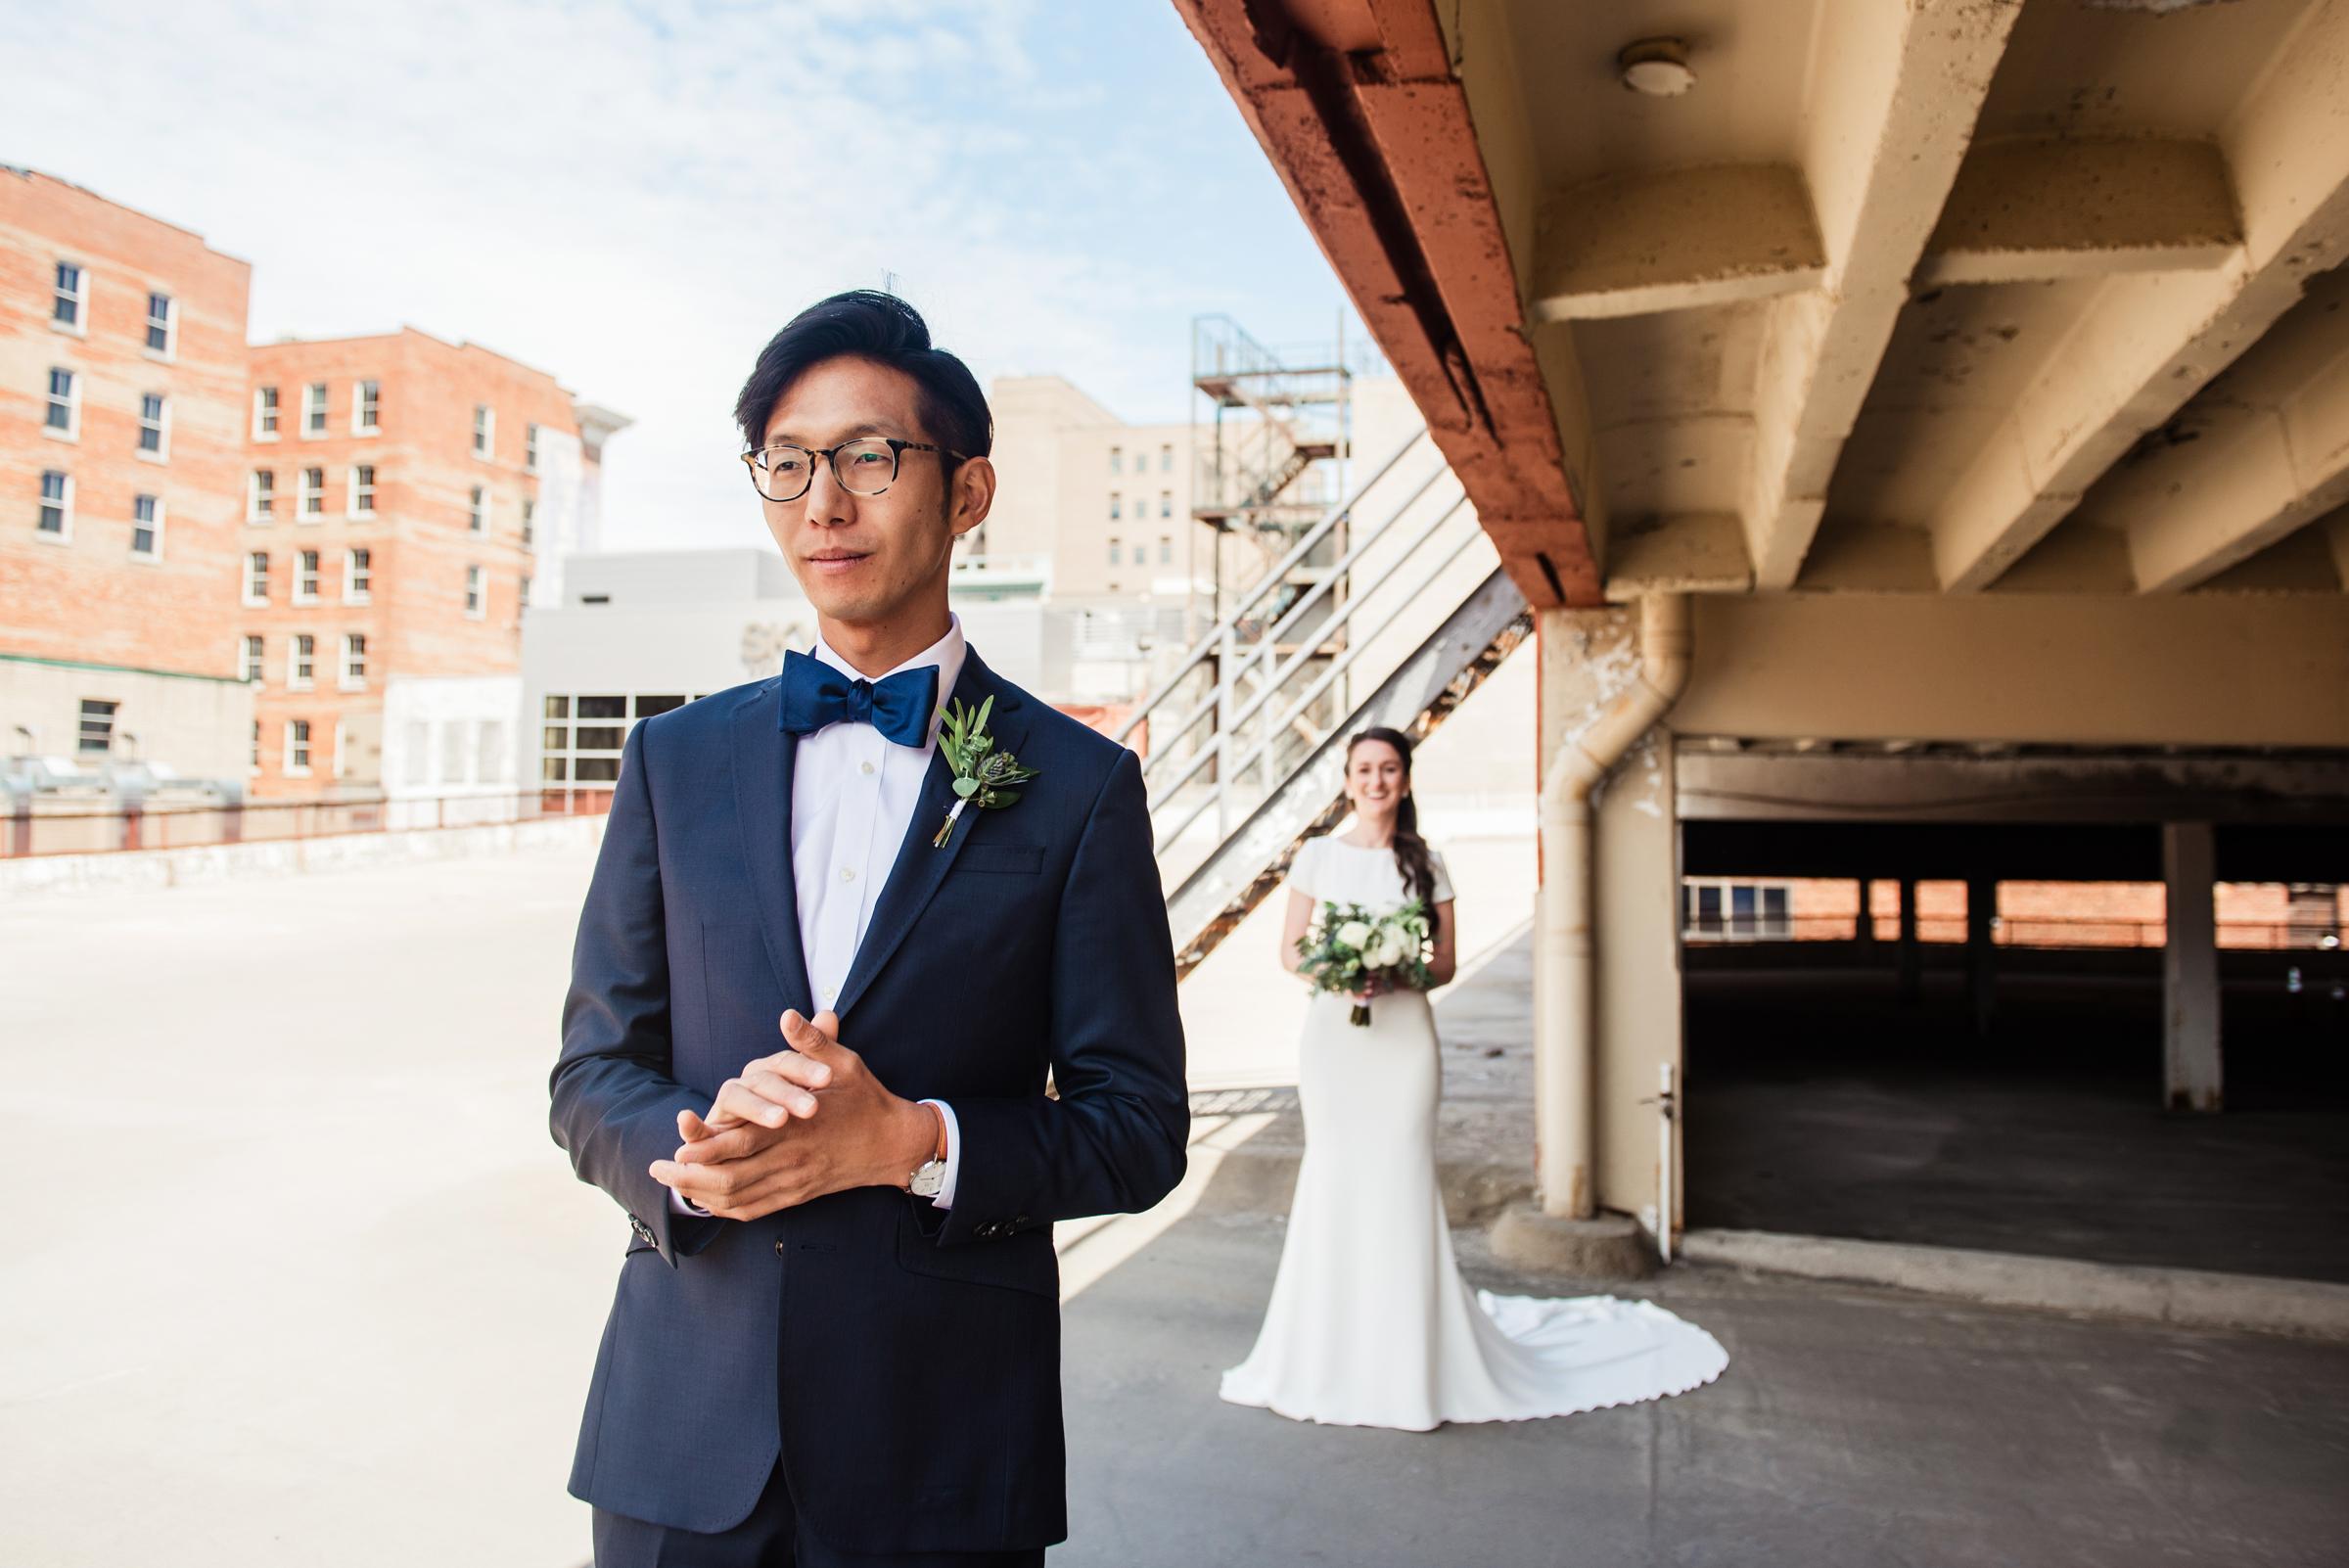 SKY_Armory_Syracuse_Wedding_JILL_STUDIO_Rochester_NY_Photographer_DSC_5180.jpg